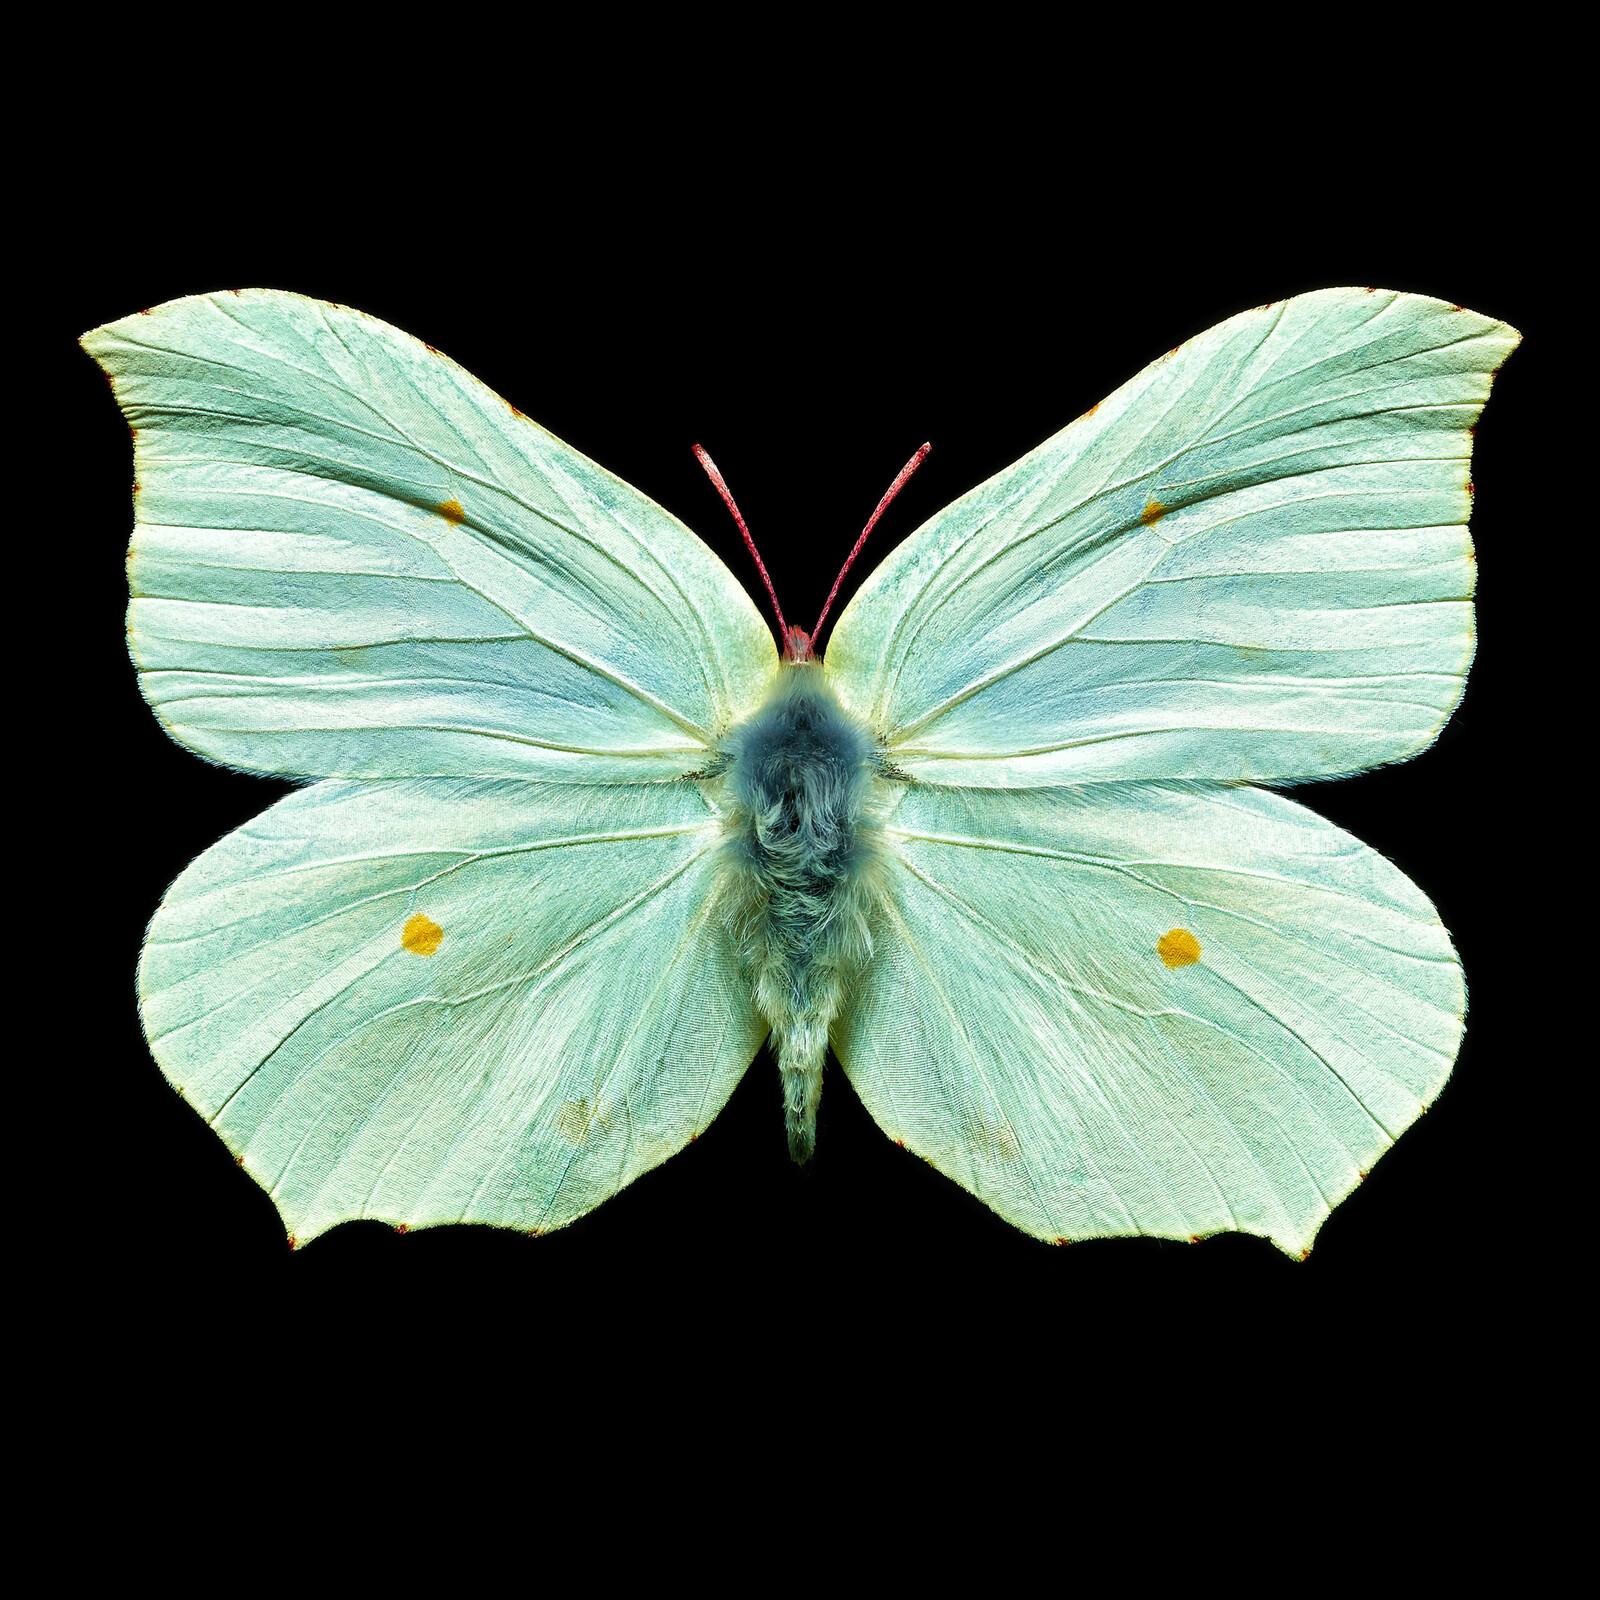 Butterfly V - Heiko Hellwig